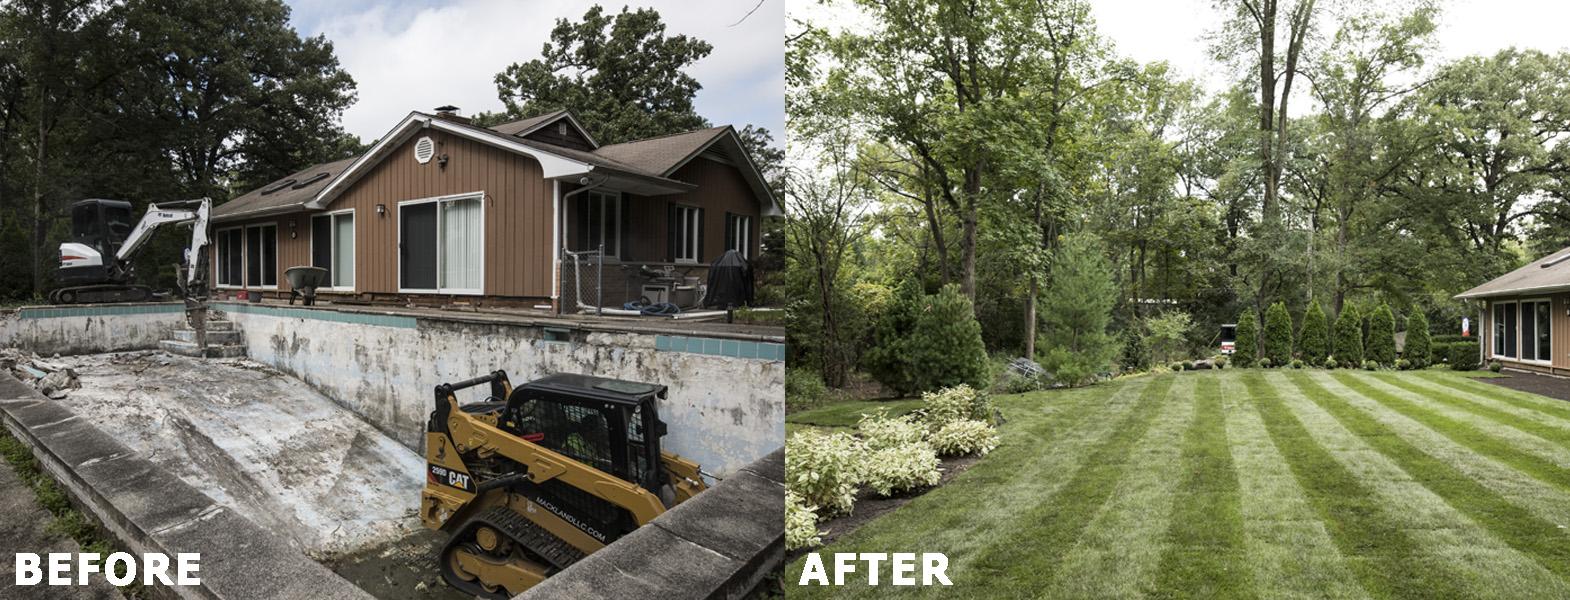 Mack Land LLC - Libertyville, IL Concrete Pool Removal